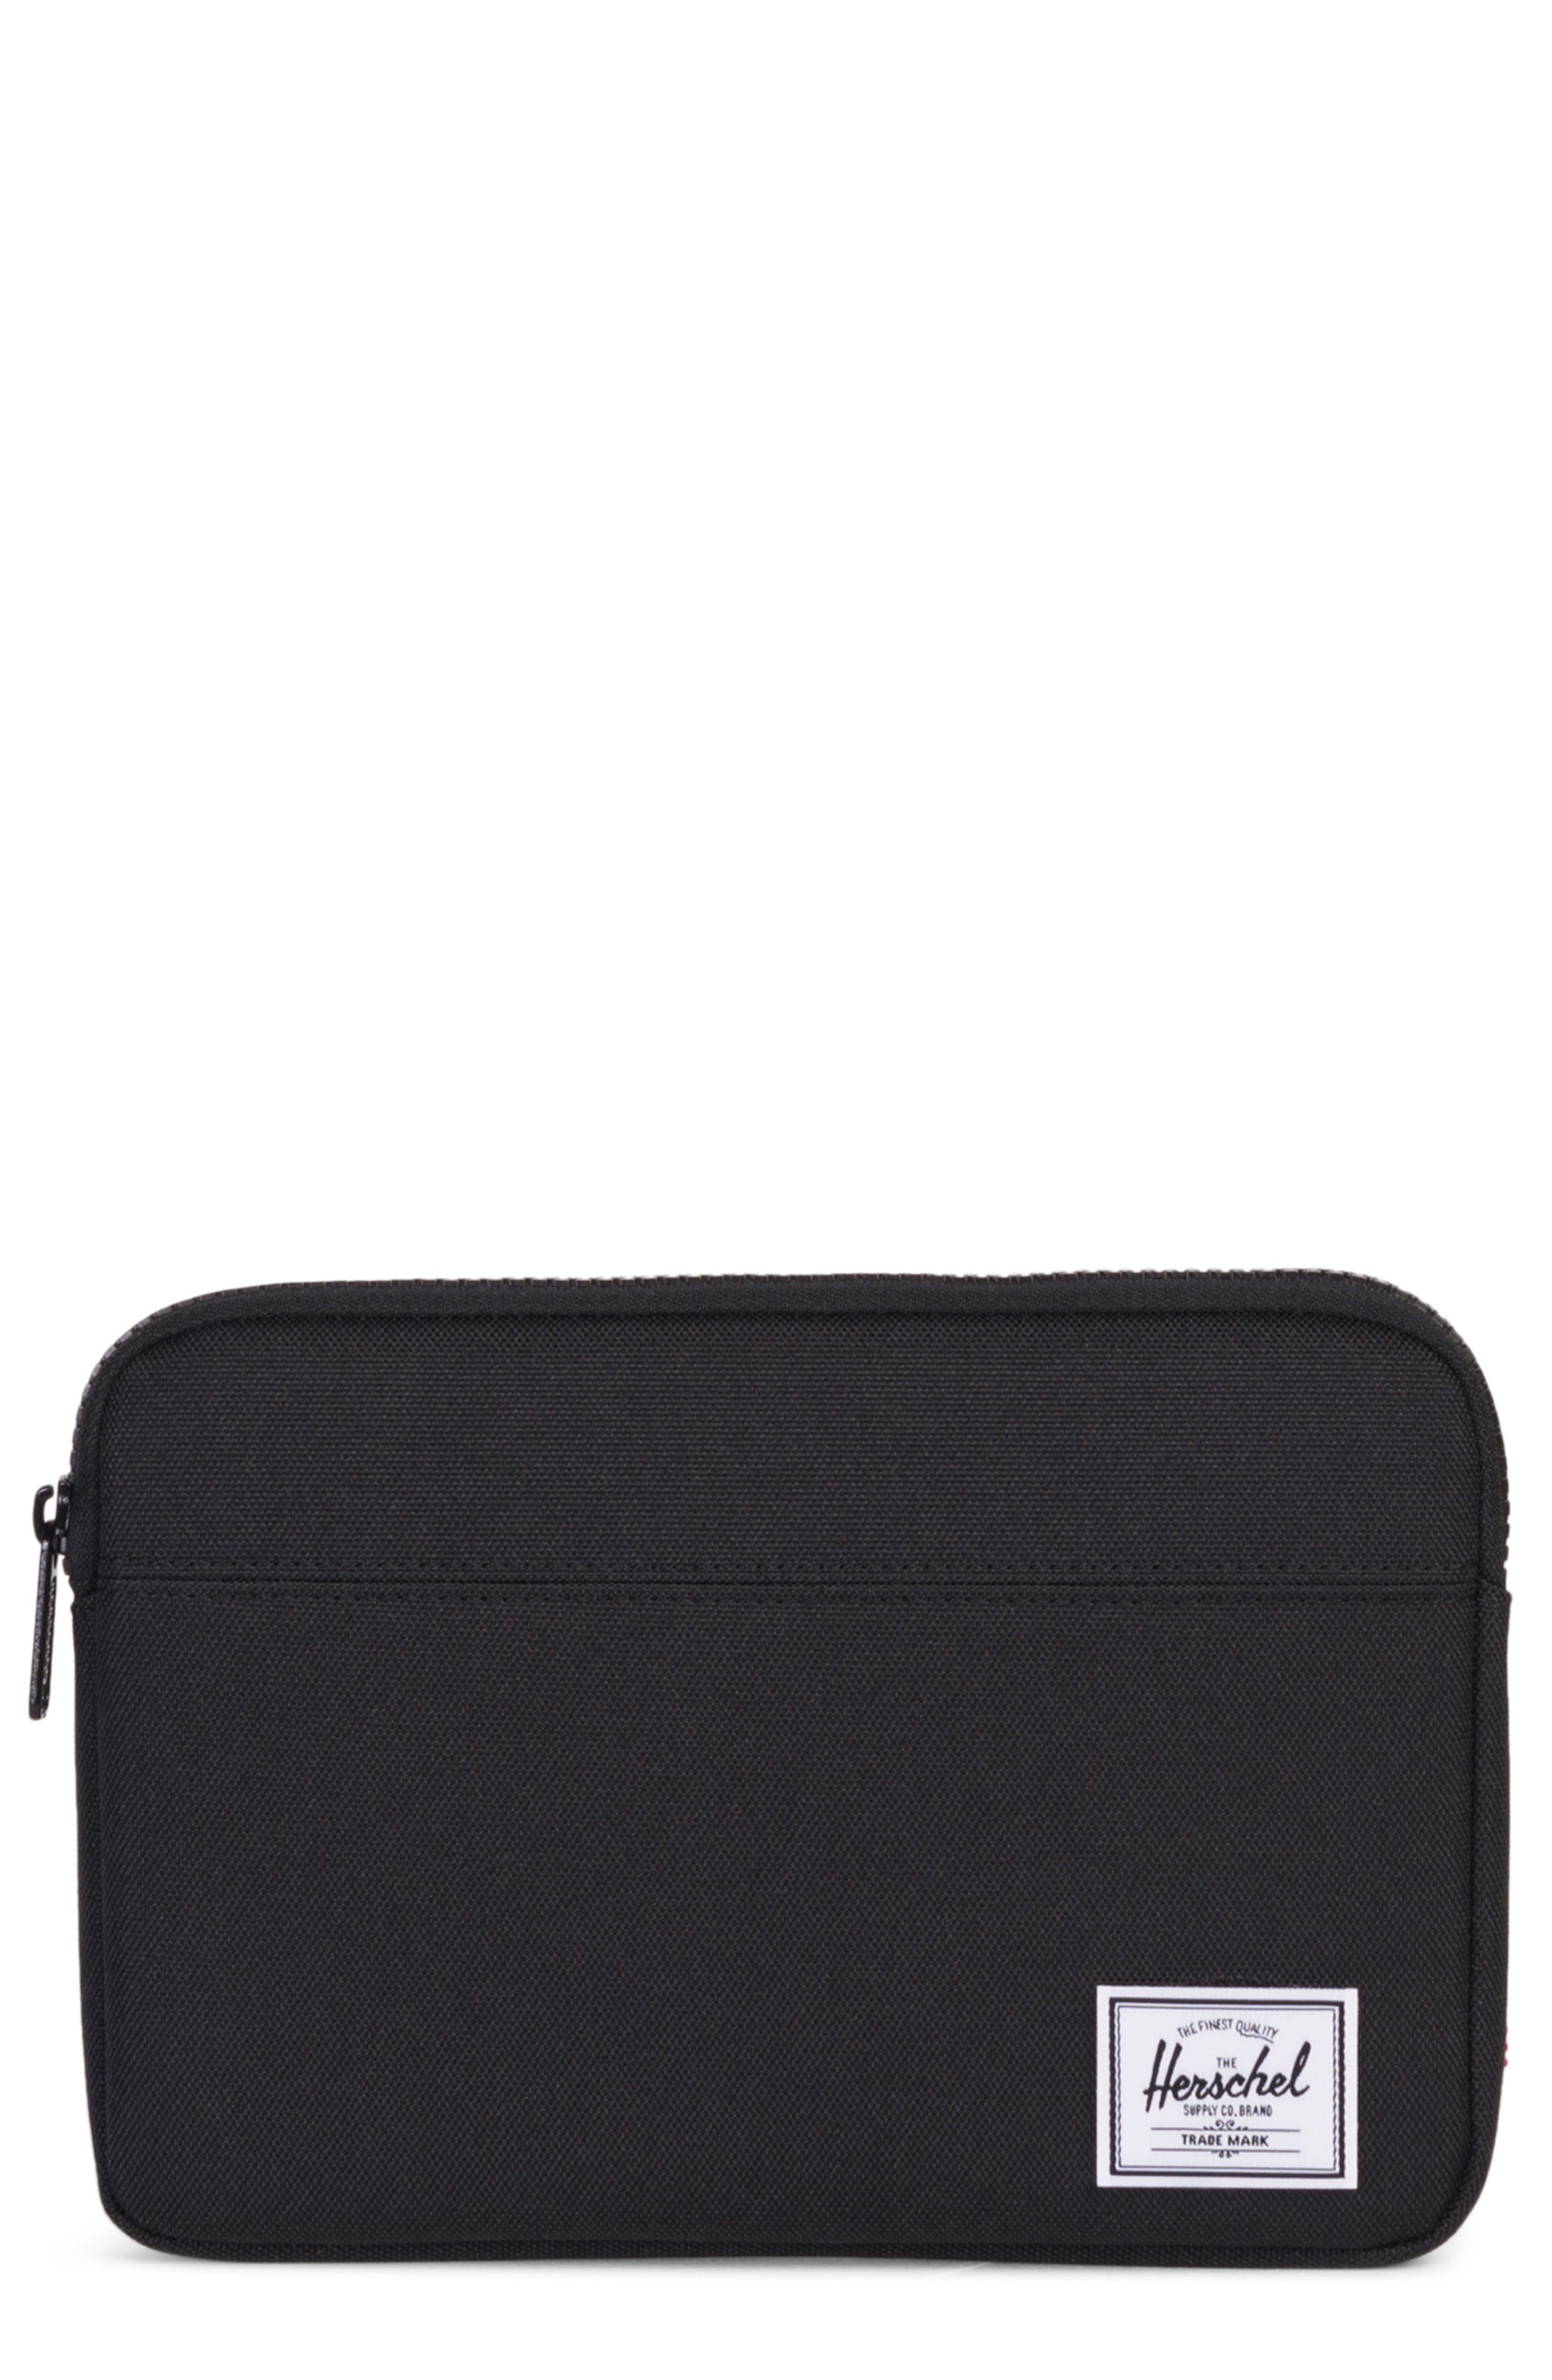 Anchor Ipad Mini Tablet Sleeve